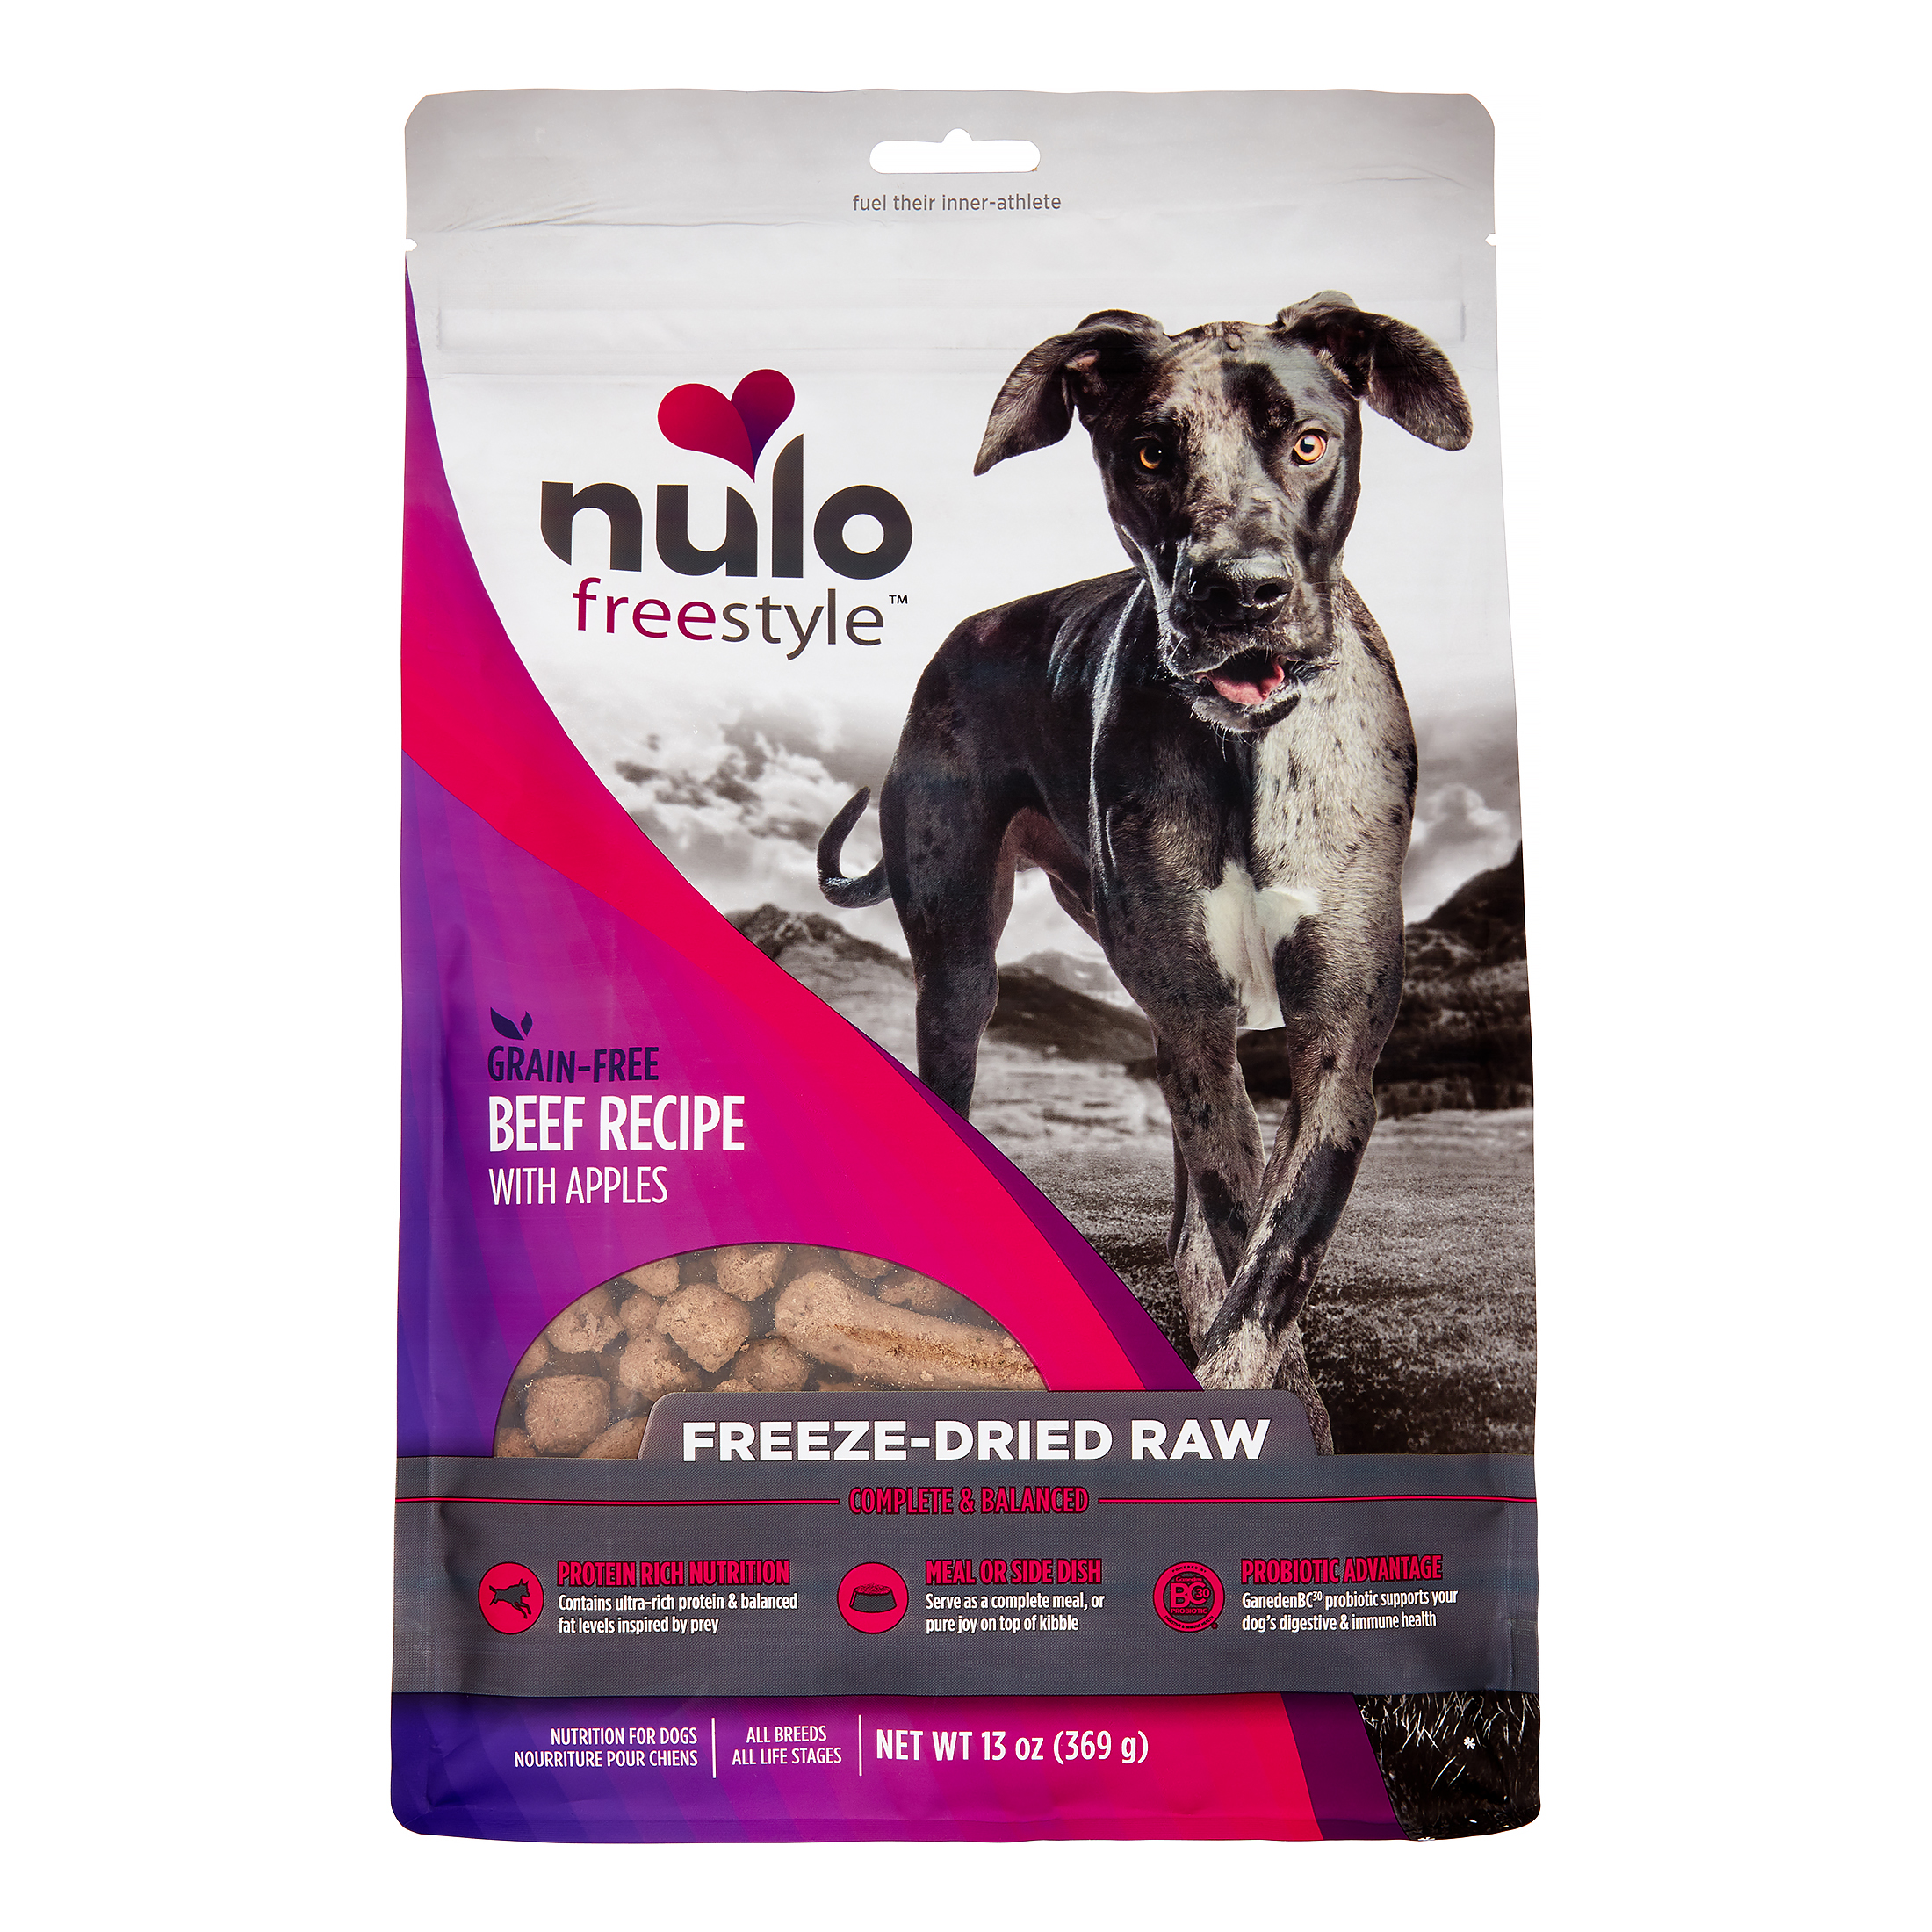 Nulo FreeStyle Freeze-Dried Beef Dog Food, 13 Oz